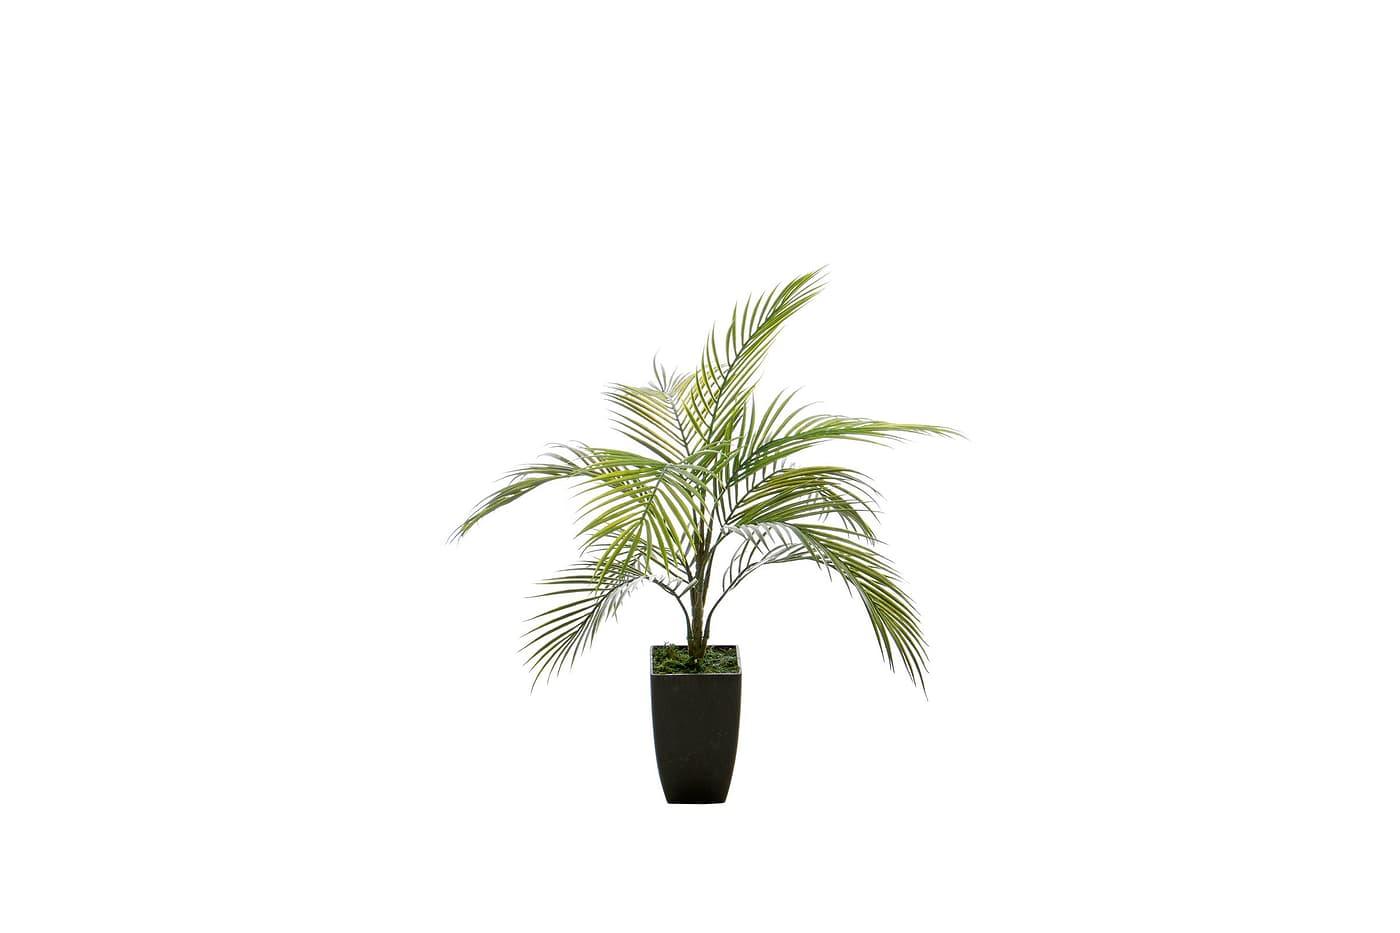 do it garden areca palmier migros. Black Bedroom Furniture Sets. Home Design Ideas